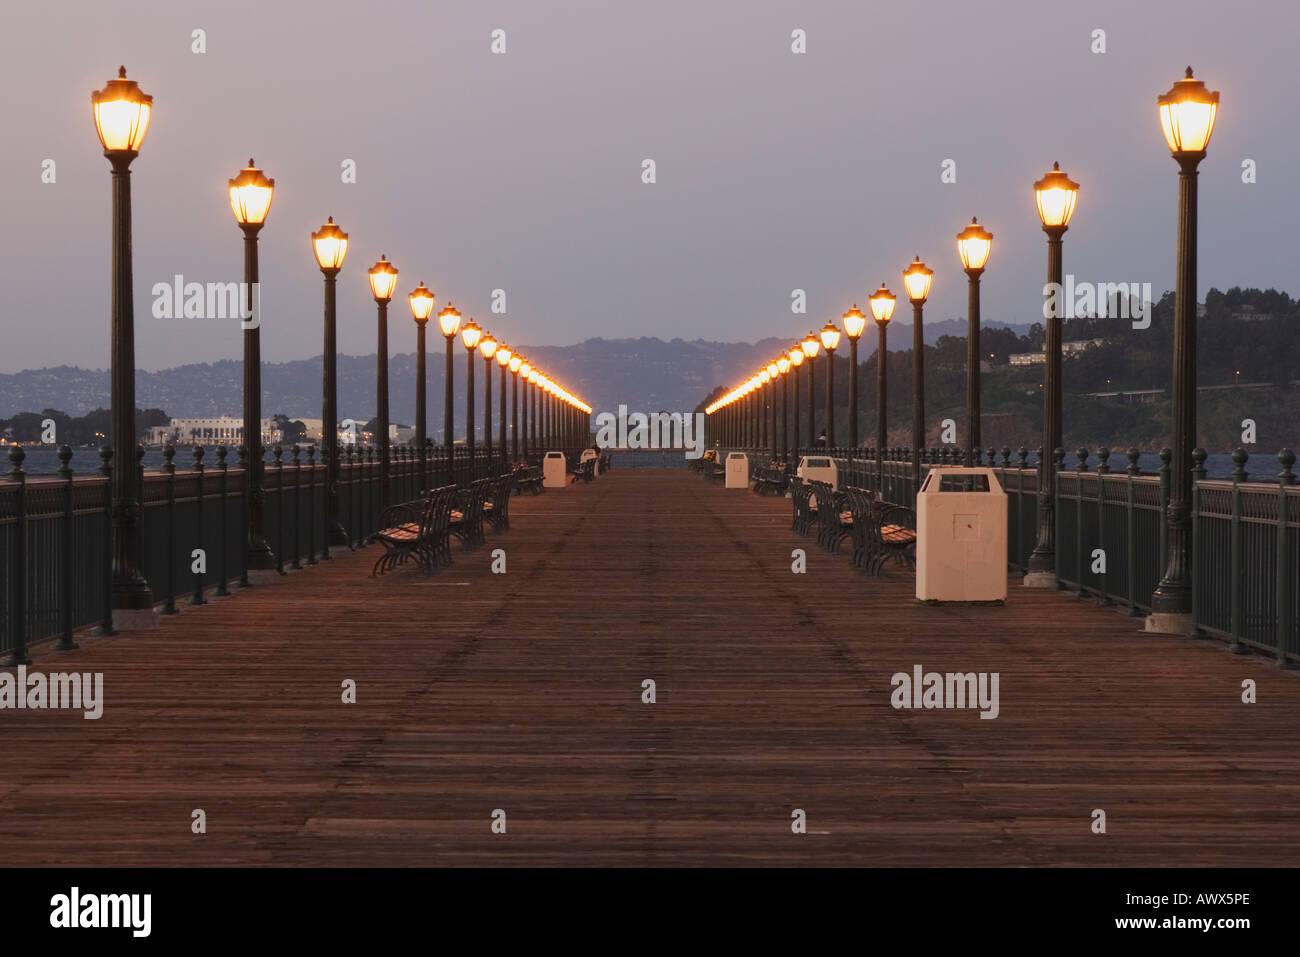 Lamps On Pier 7 During Dusk At The San Francisco Waterfront San Francisco California Usa